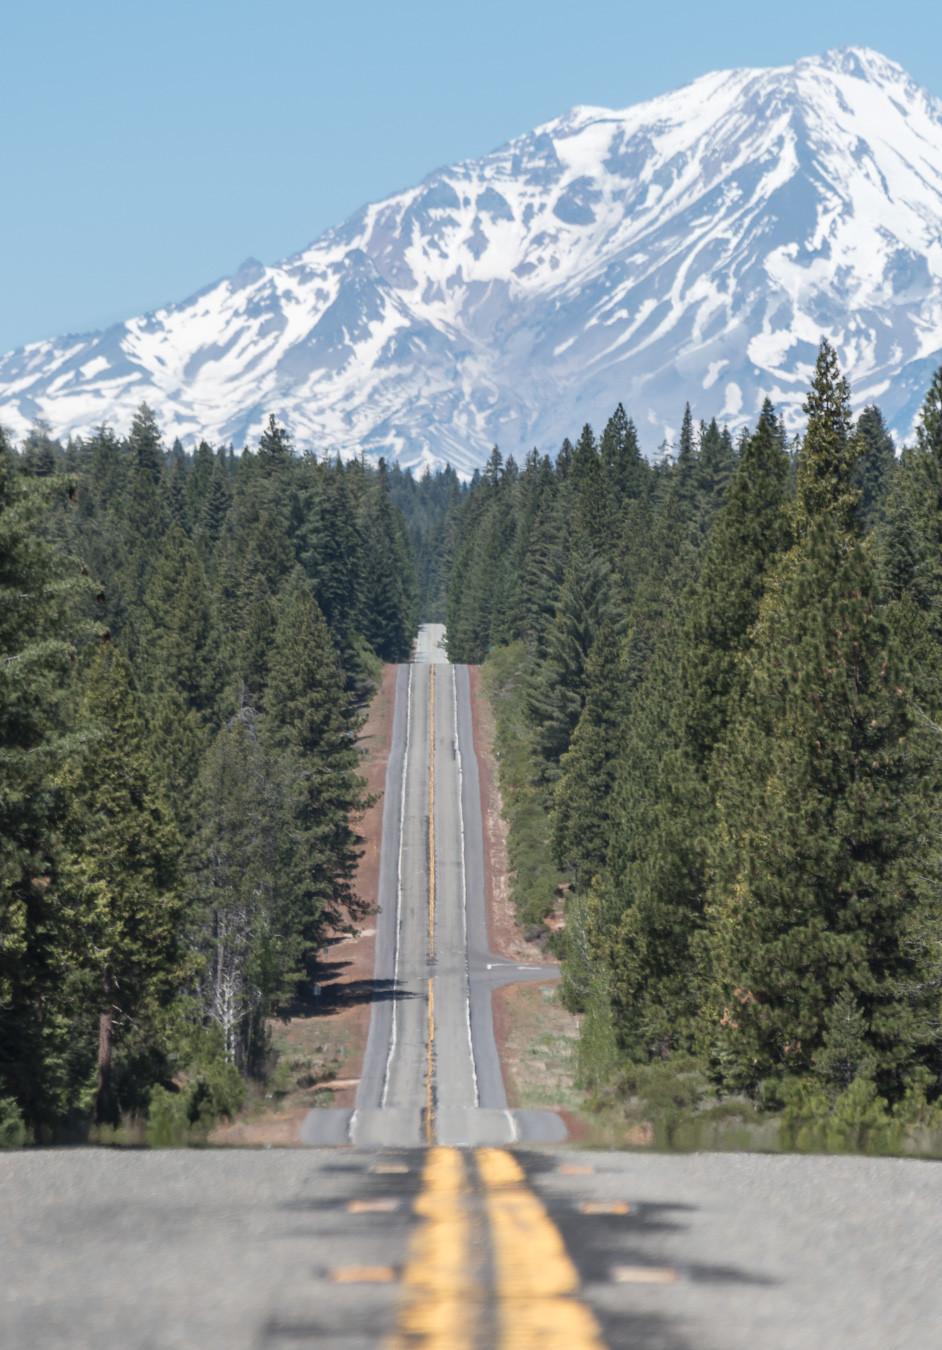 Mt Shasta along Hwy 89 in Northern California